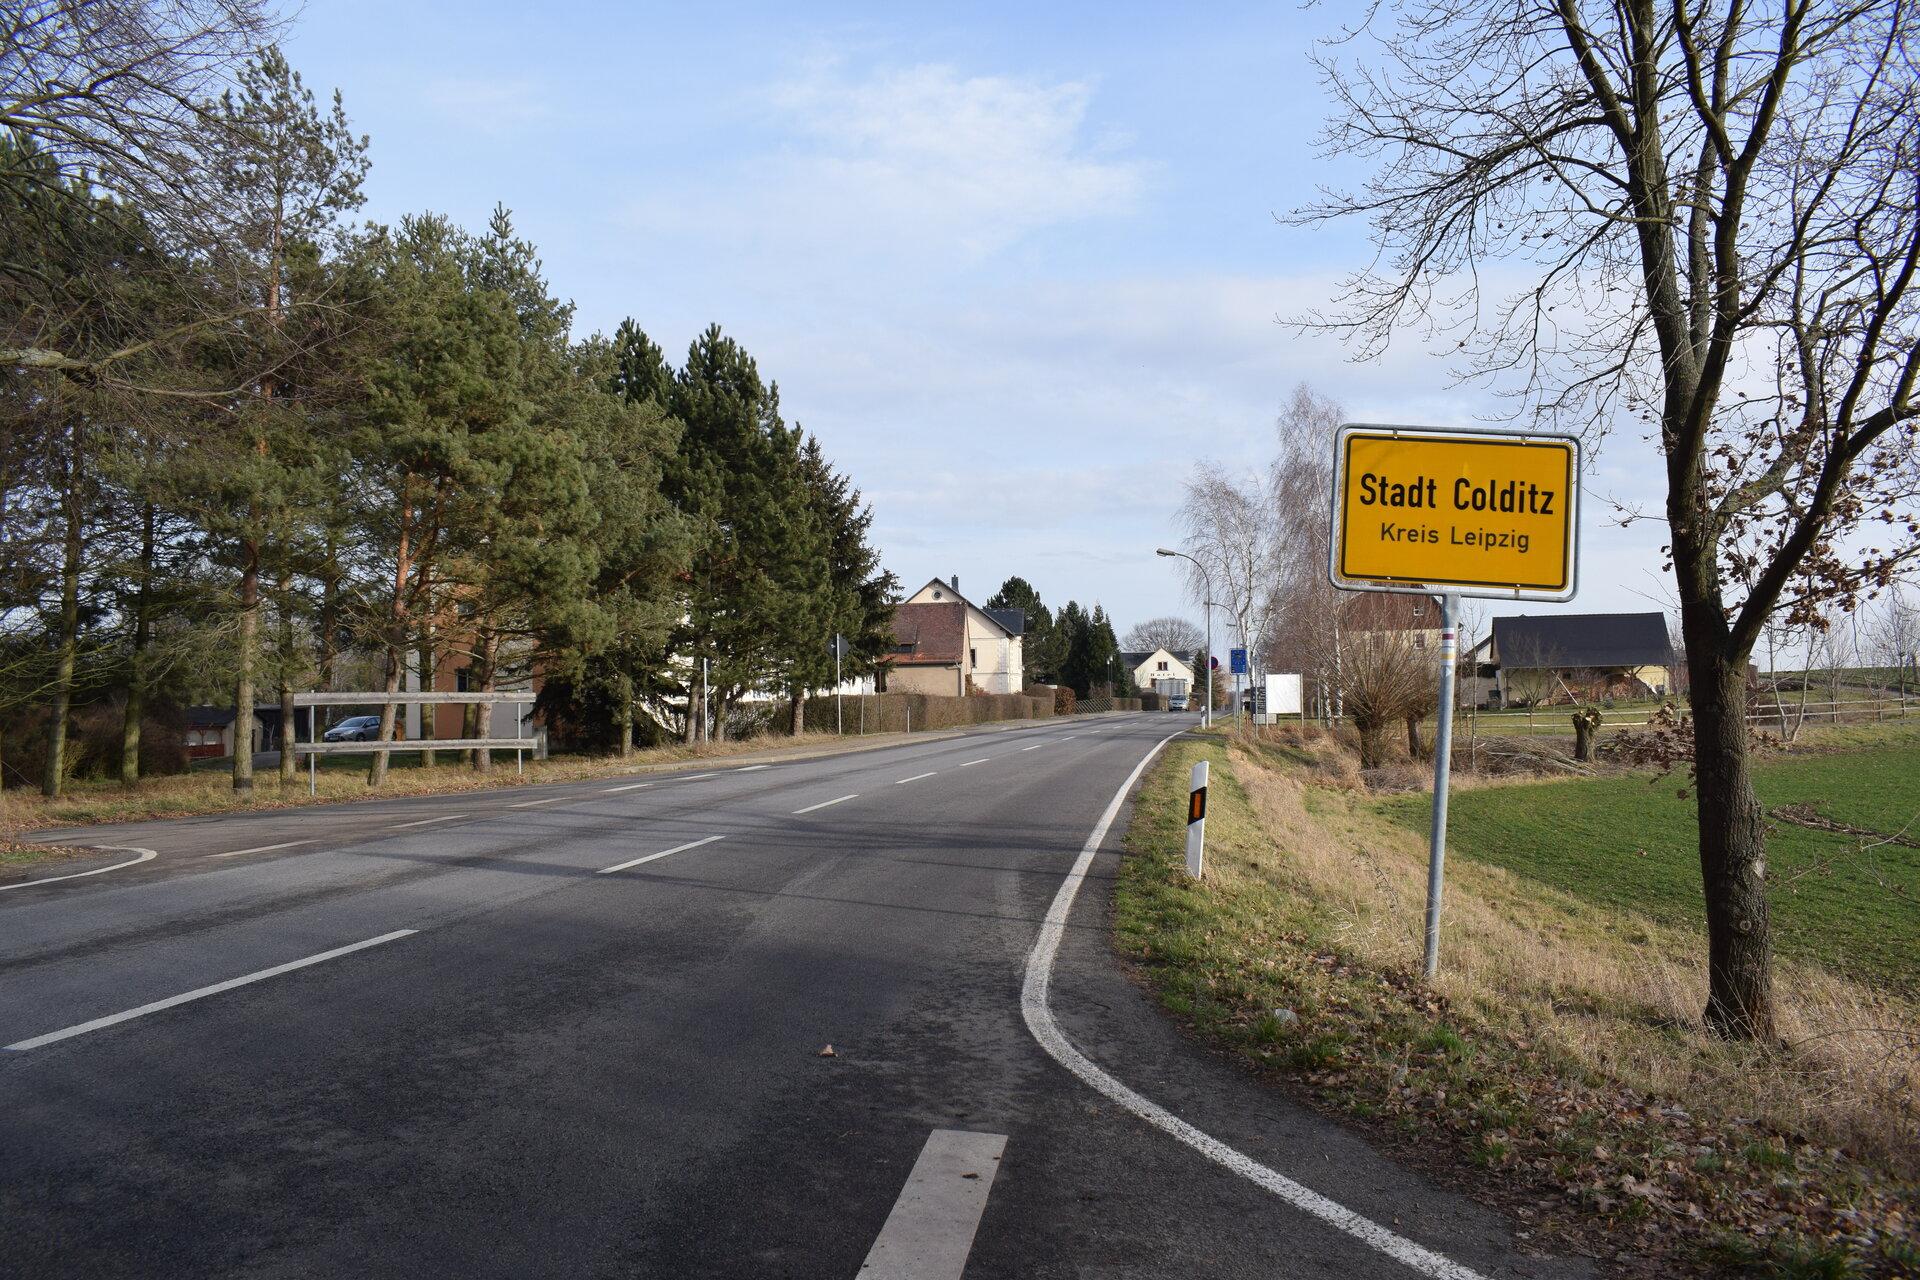 Ortseingang Colditz - B 176 von Bad Lausick kommend